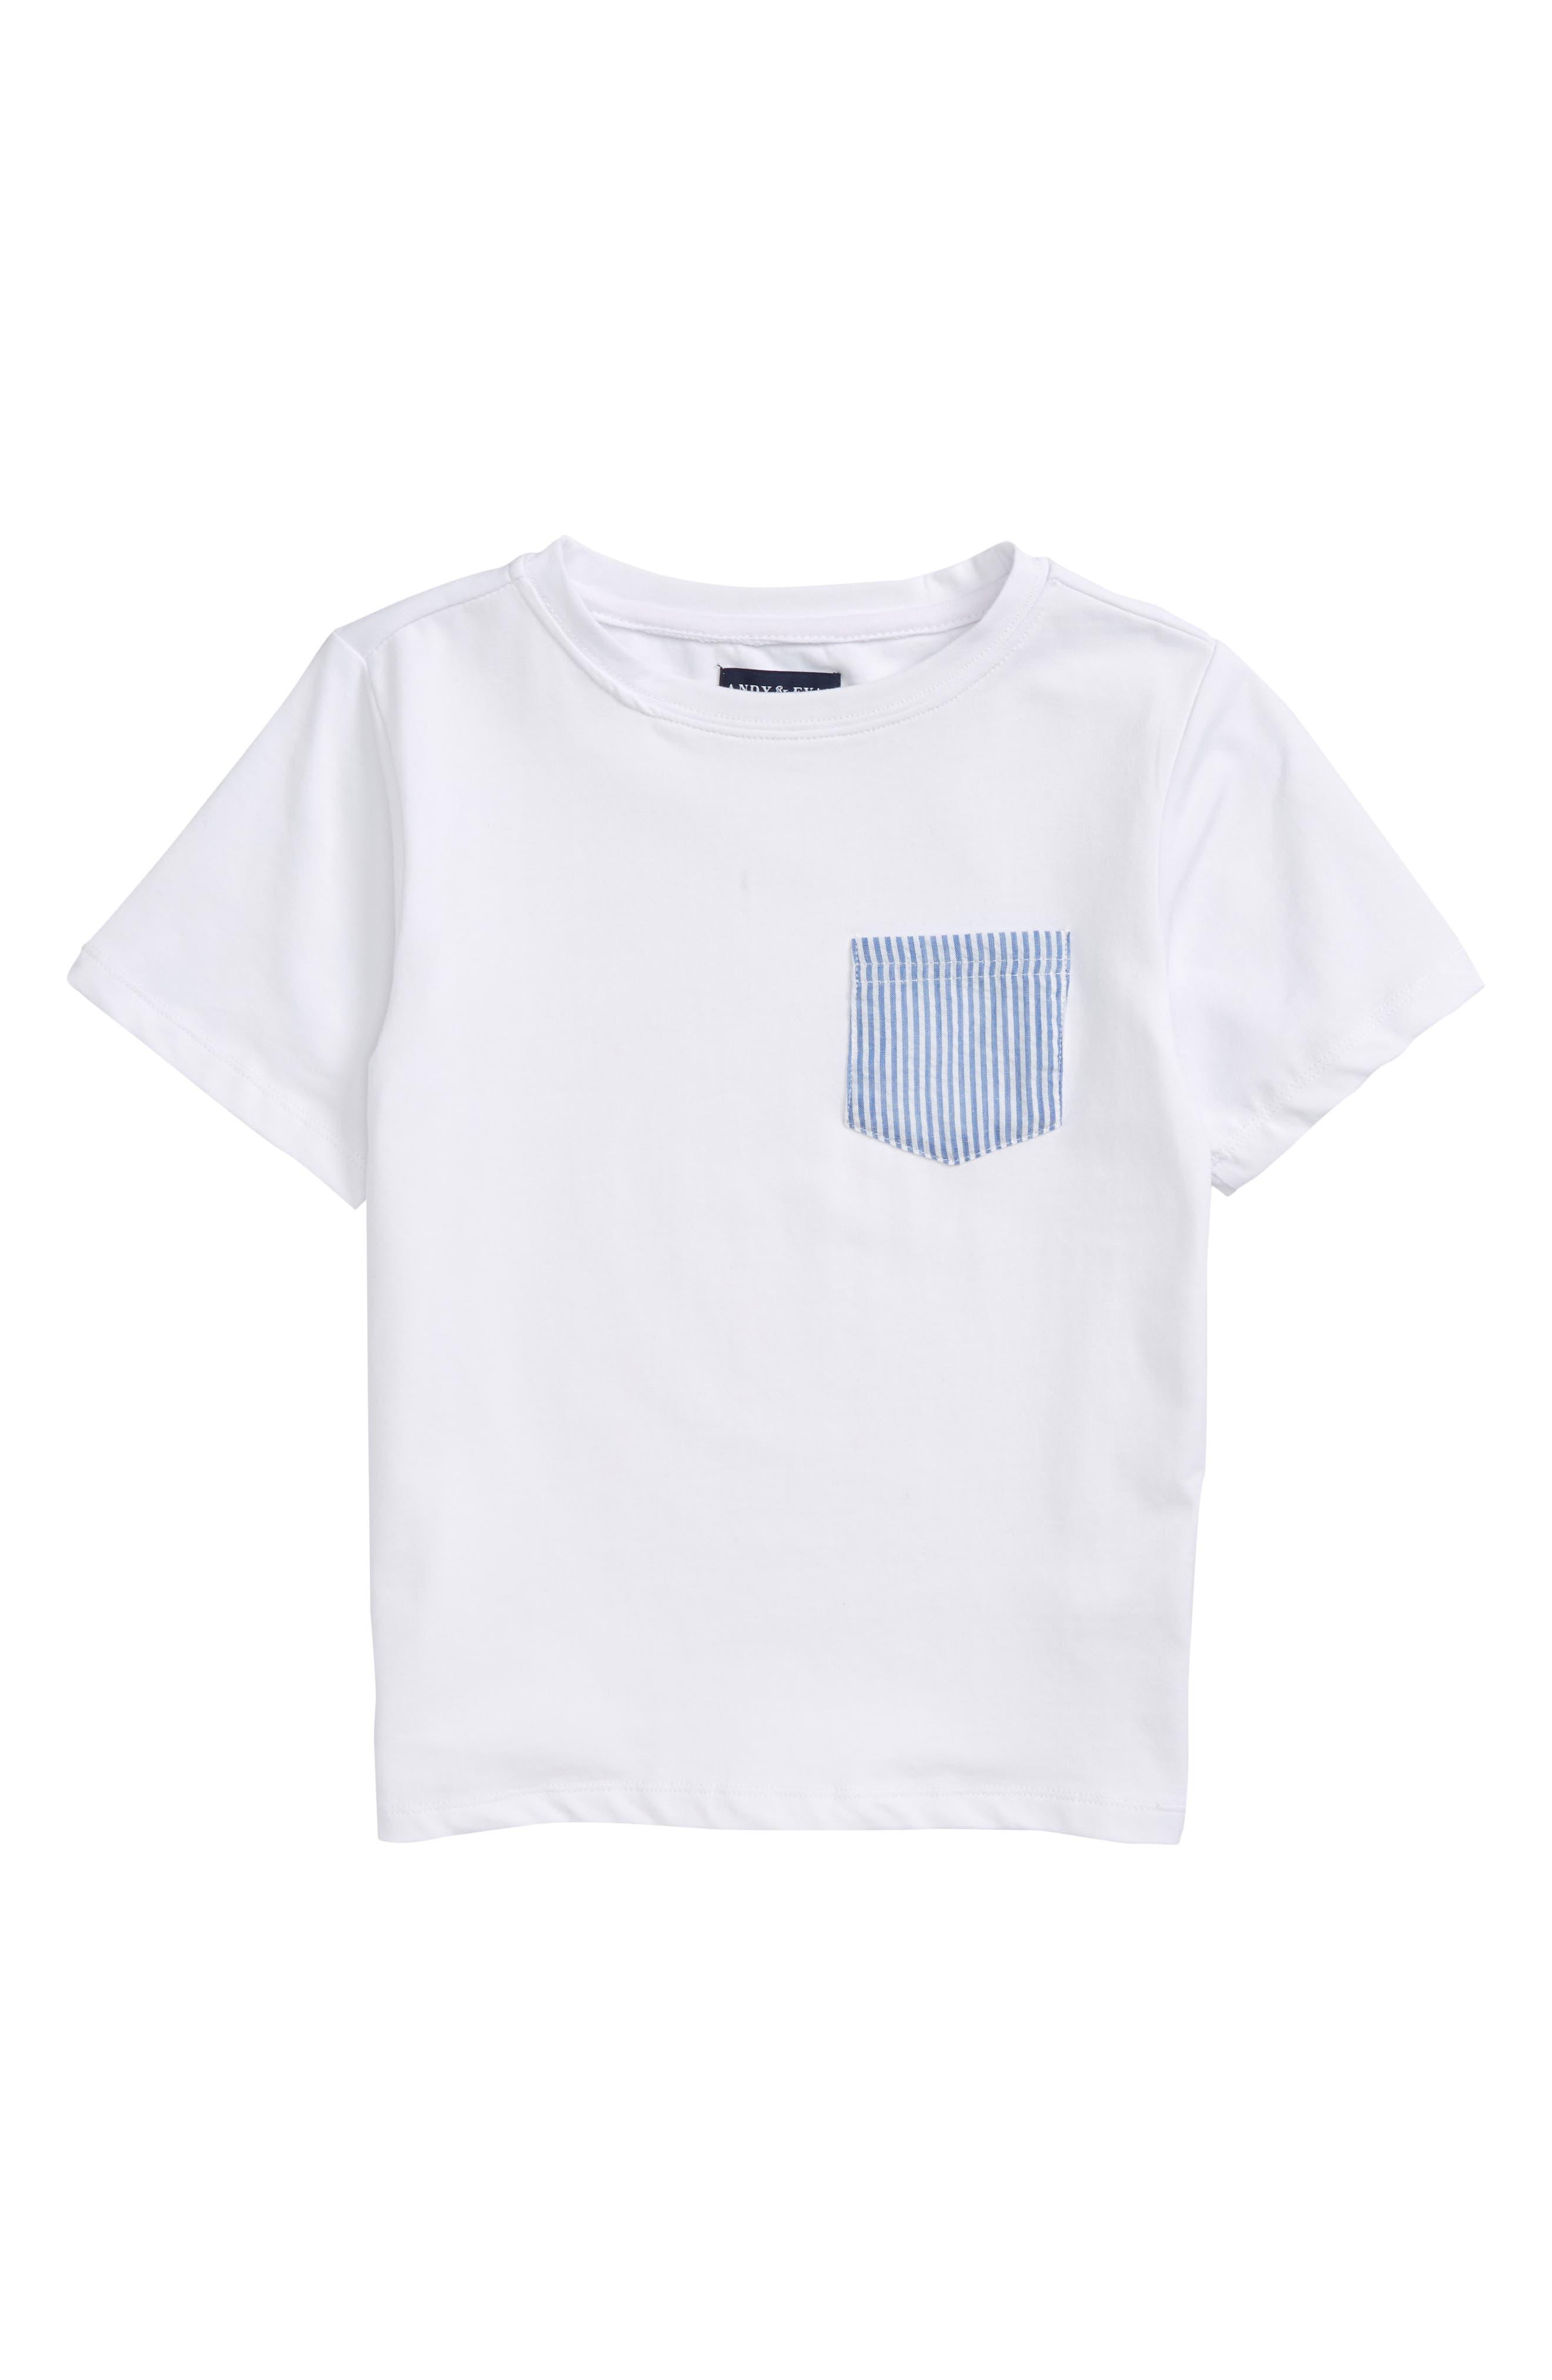 Andy & Evan Seersucker Pocket T-Shirt (Toddler Boys & Little Boys)